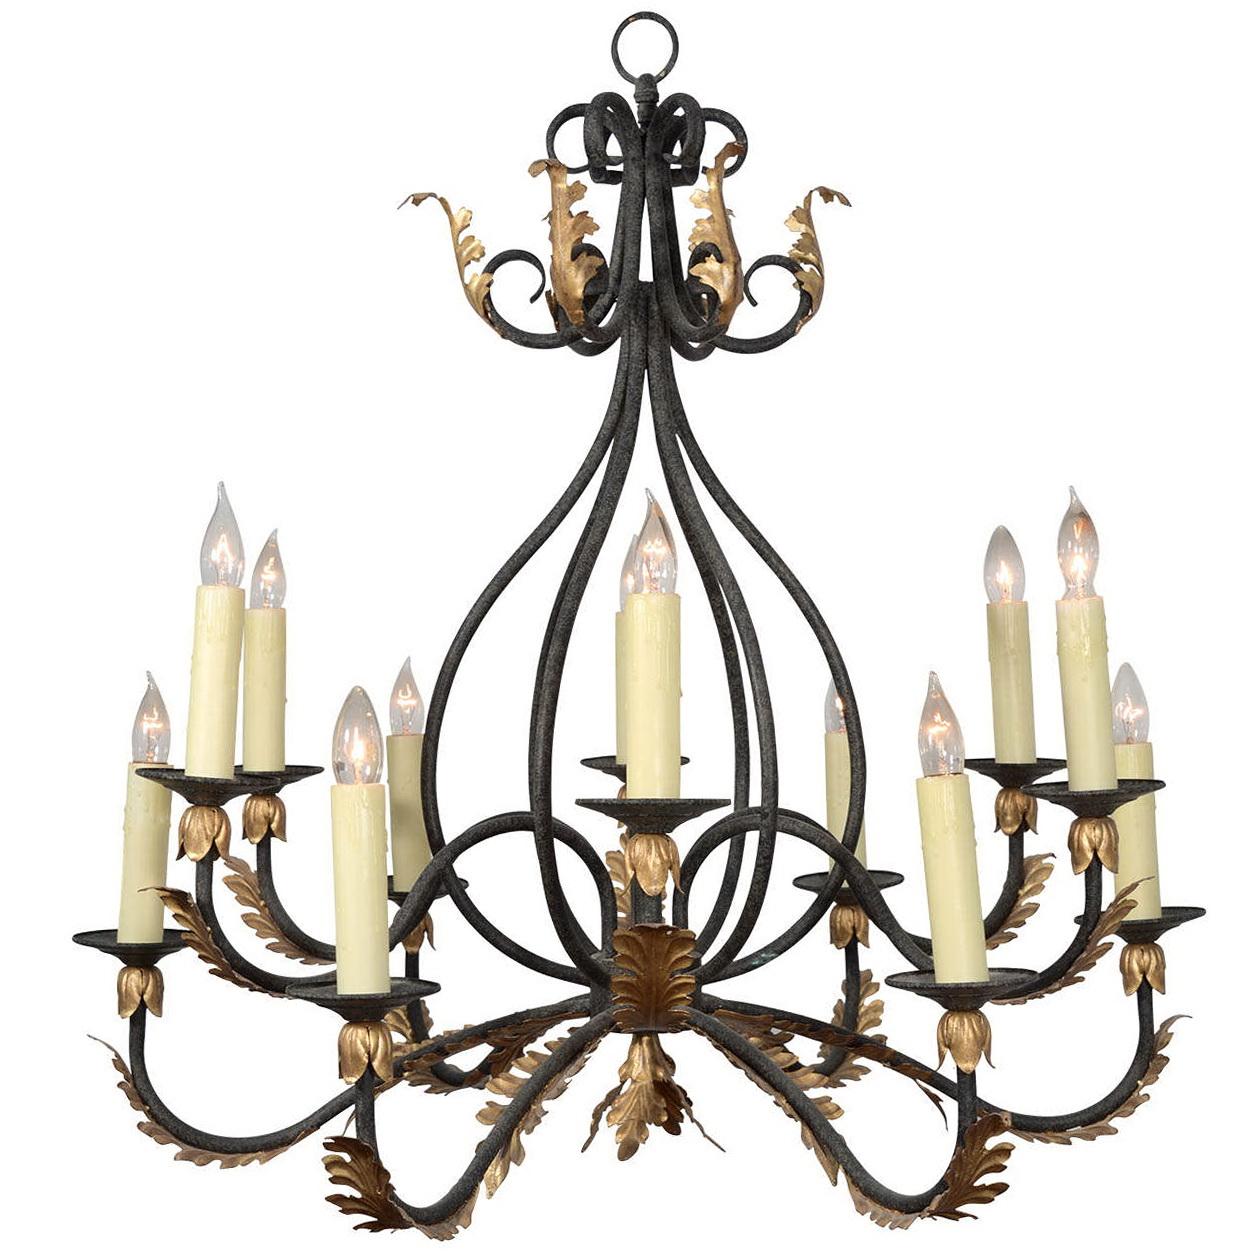 Wrought Iron Candle Chandelier Australia Home Design Ideas